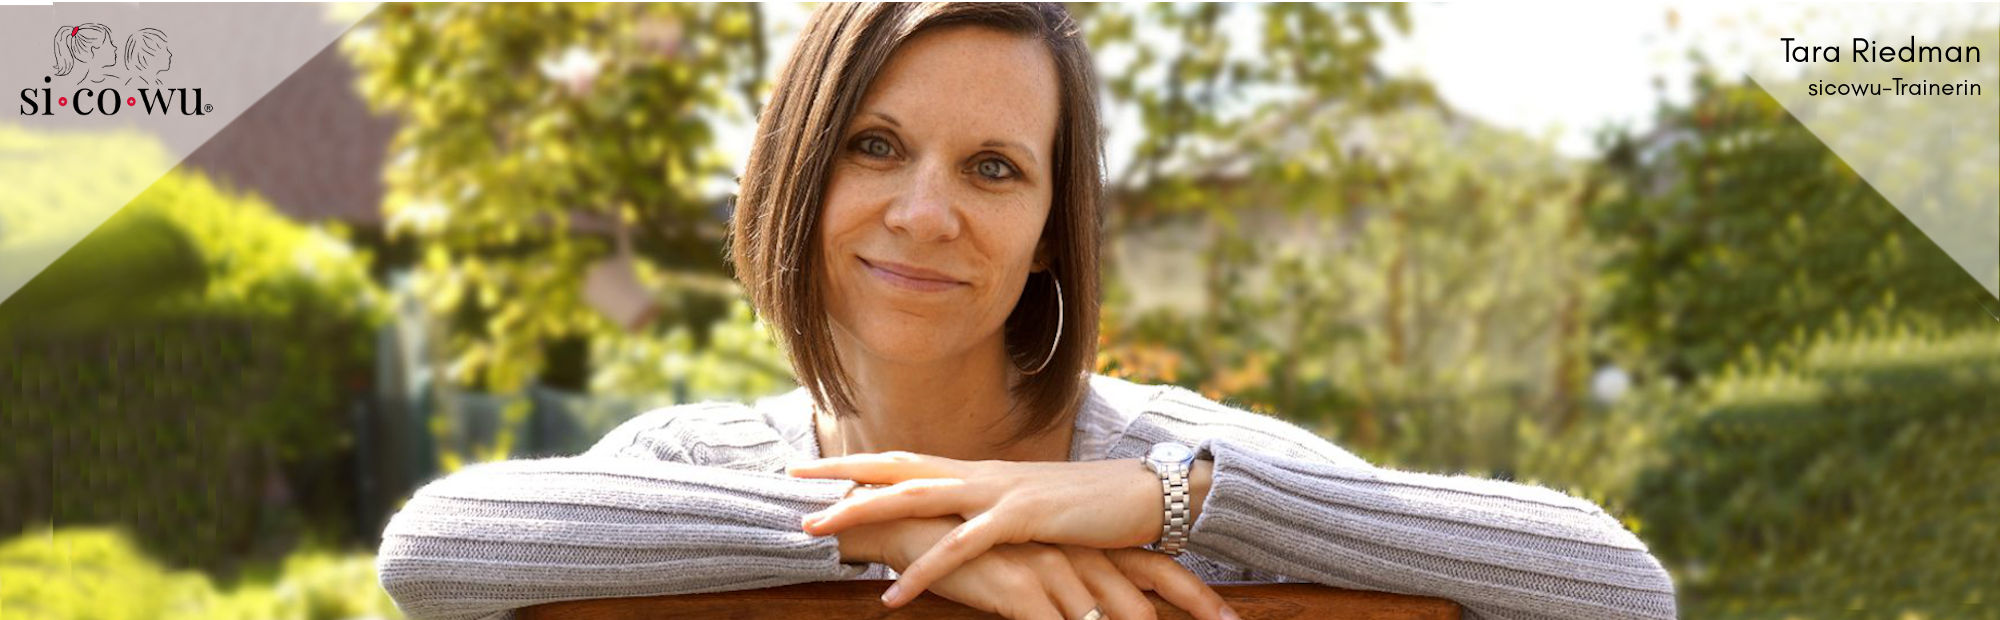 Tara Riedman, sicowu-Trainerin